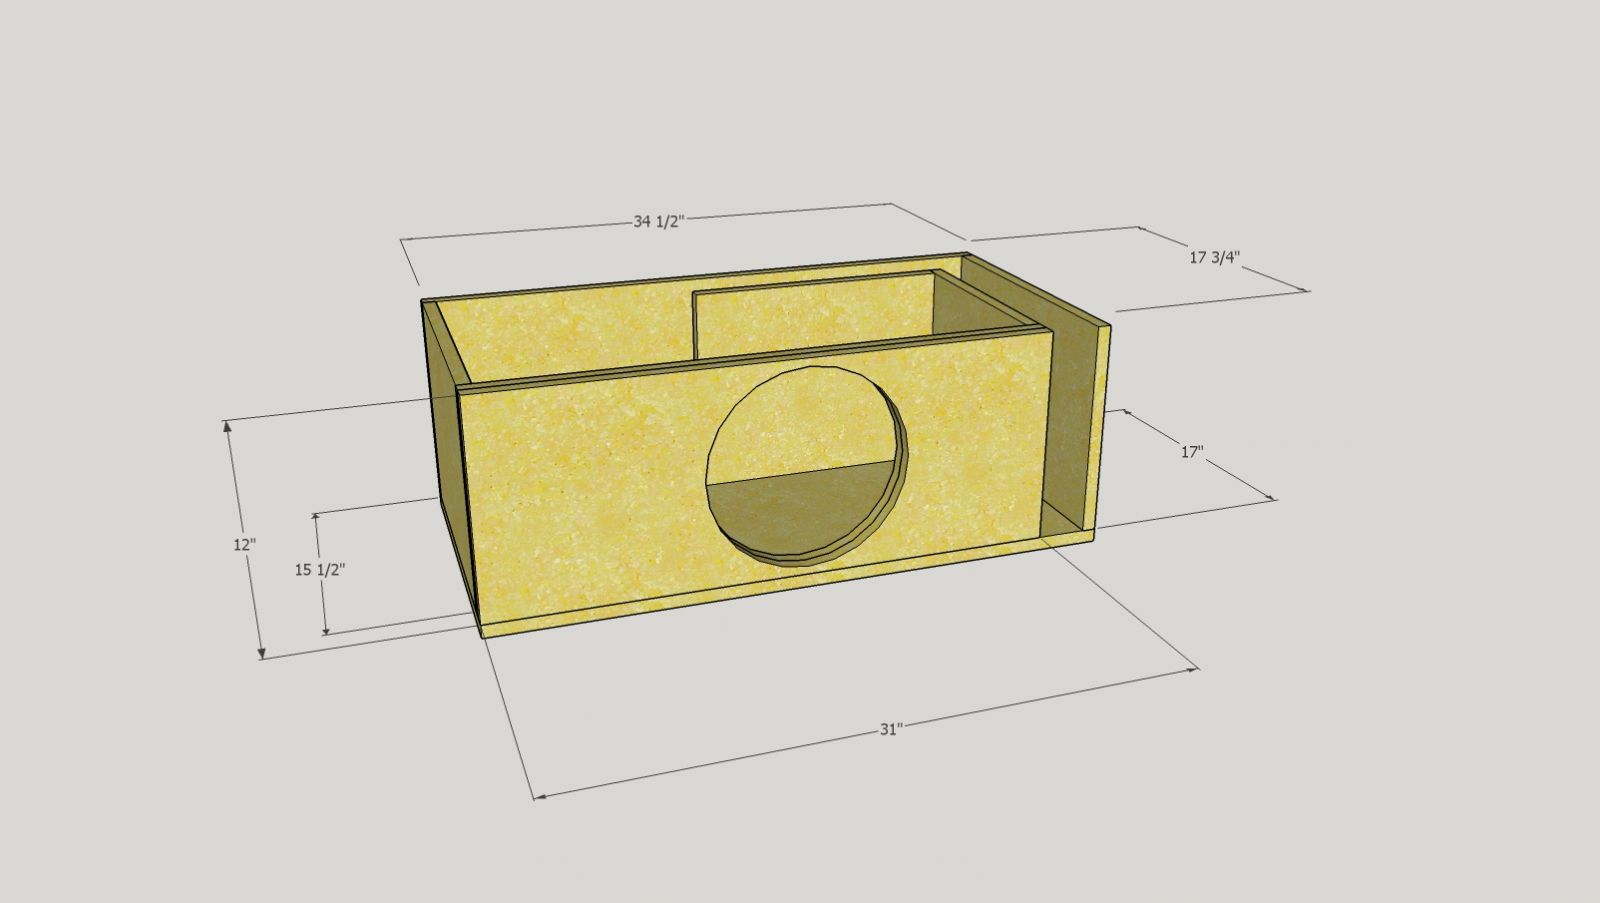 Box v1.0